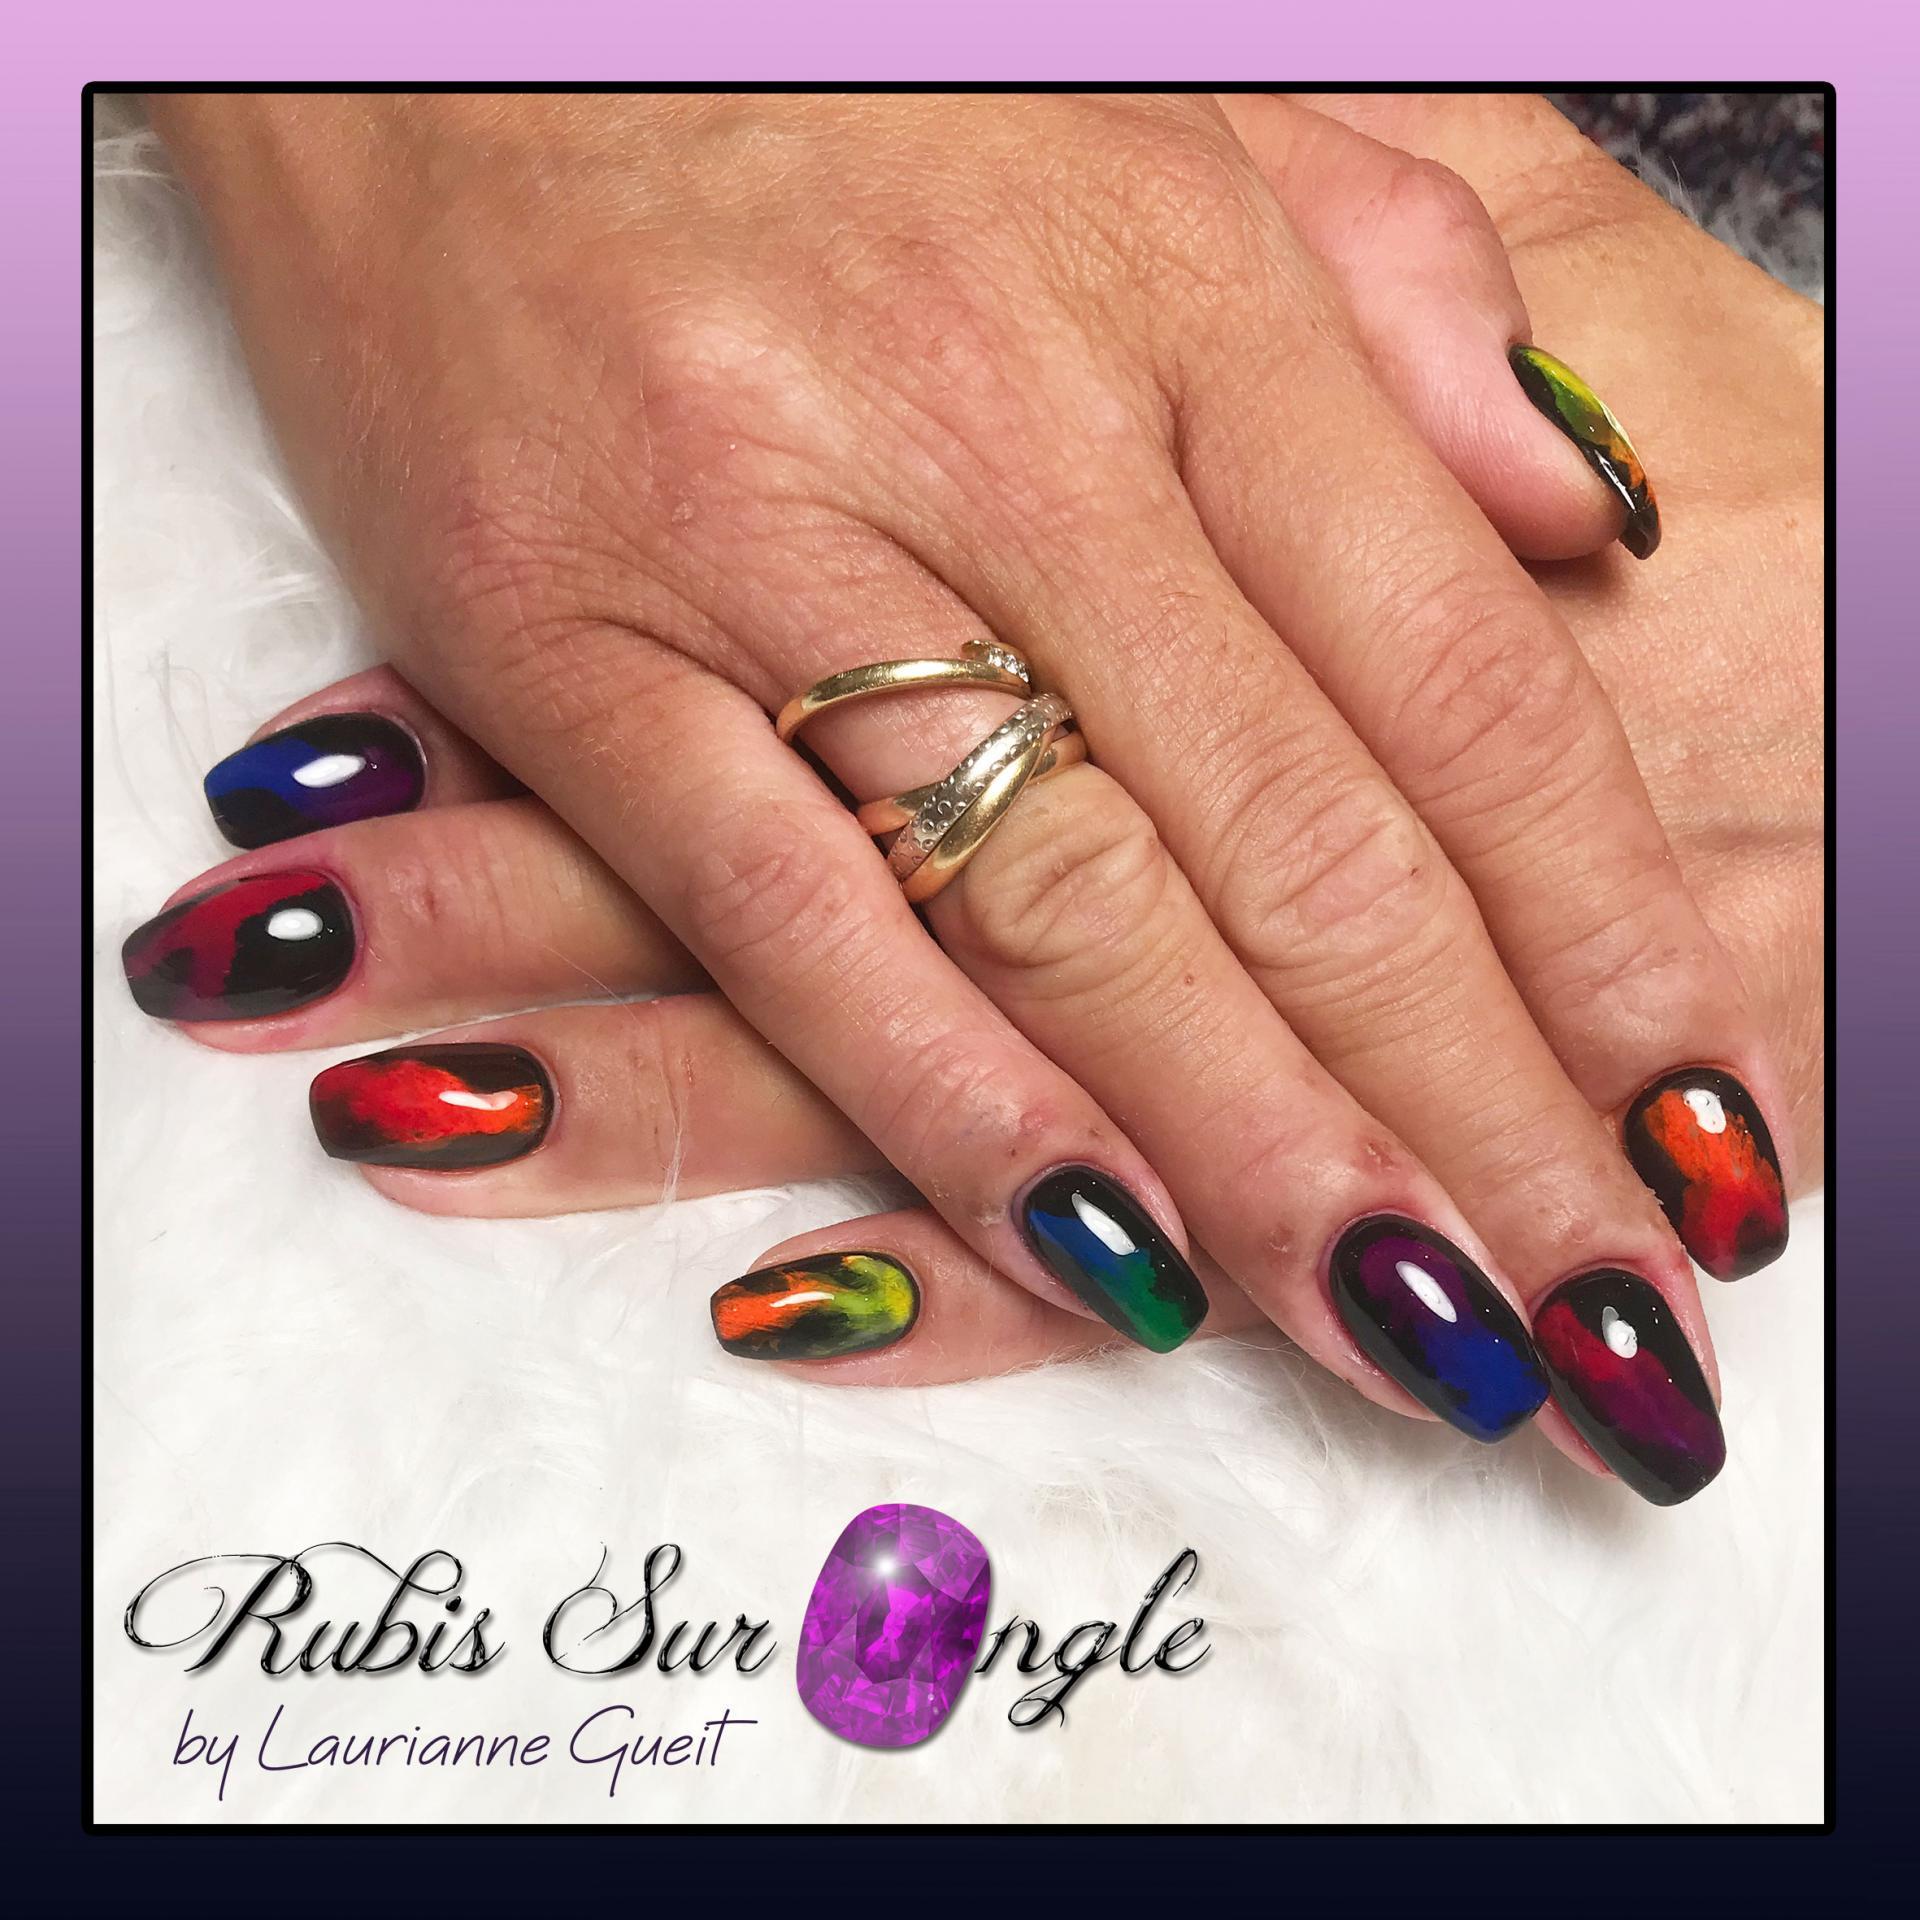 Rubis-Sur-Ongle-Nail-Art-Effet-Smoky